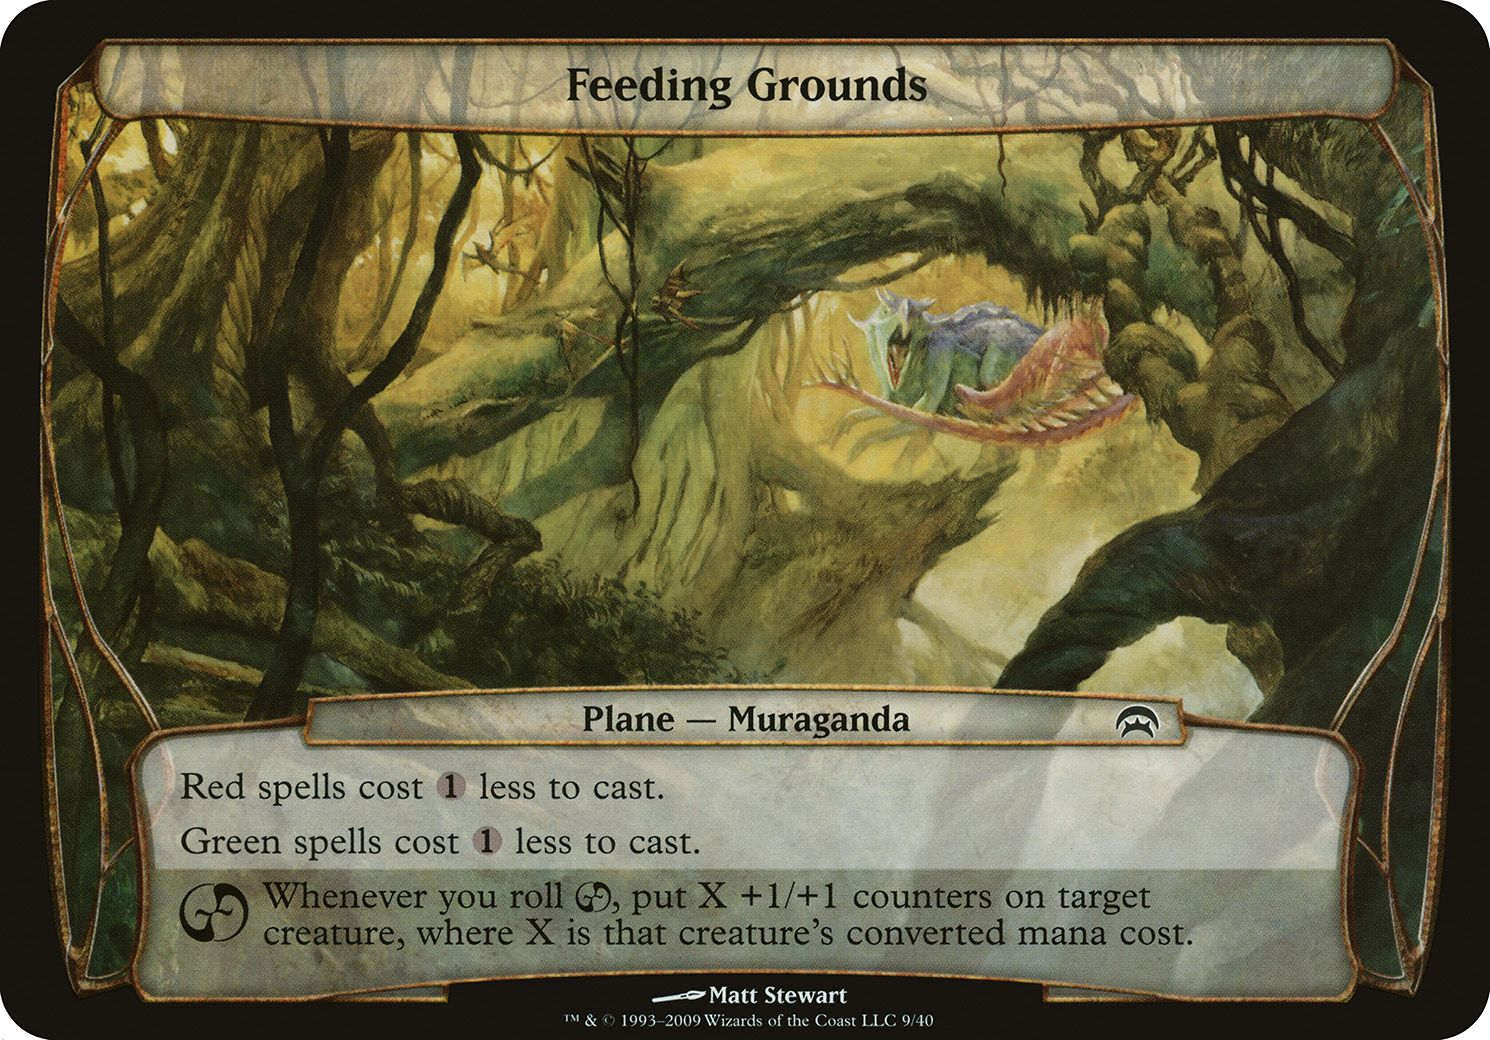 Plane Planechase Feeding Grounds Magic The Gathering Wizards Of The Coast The Gathering